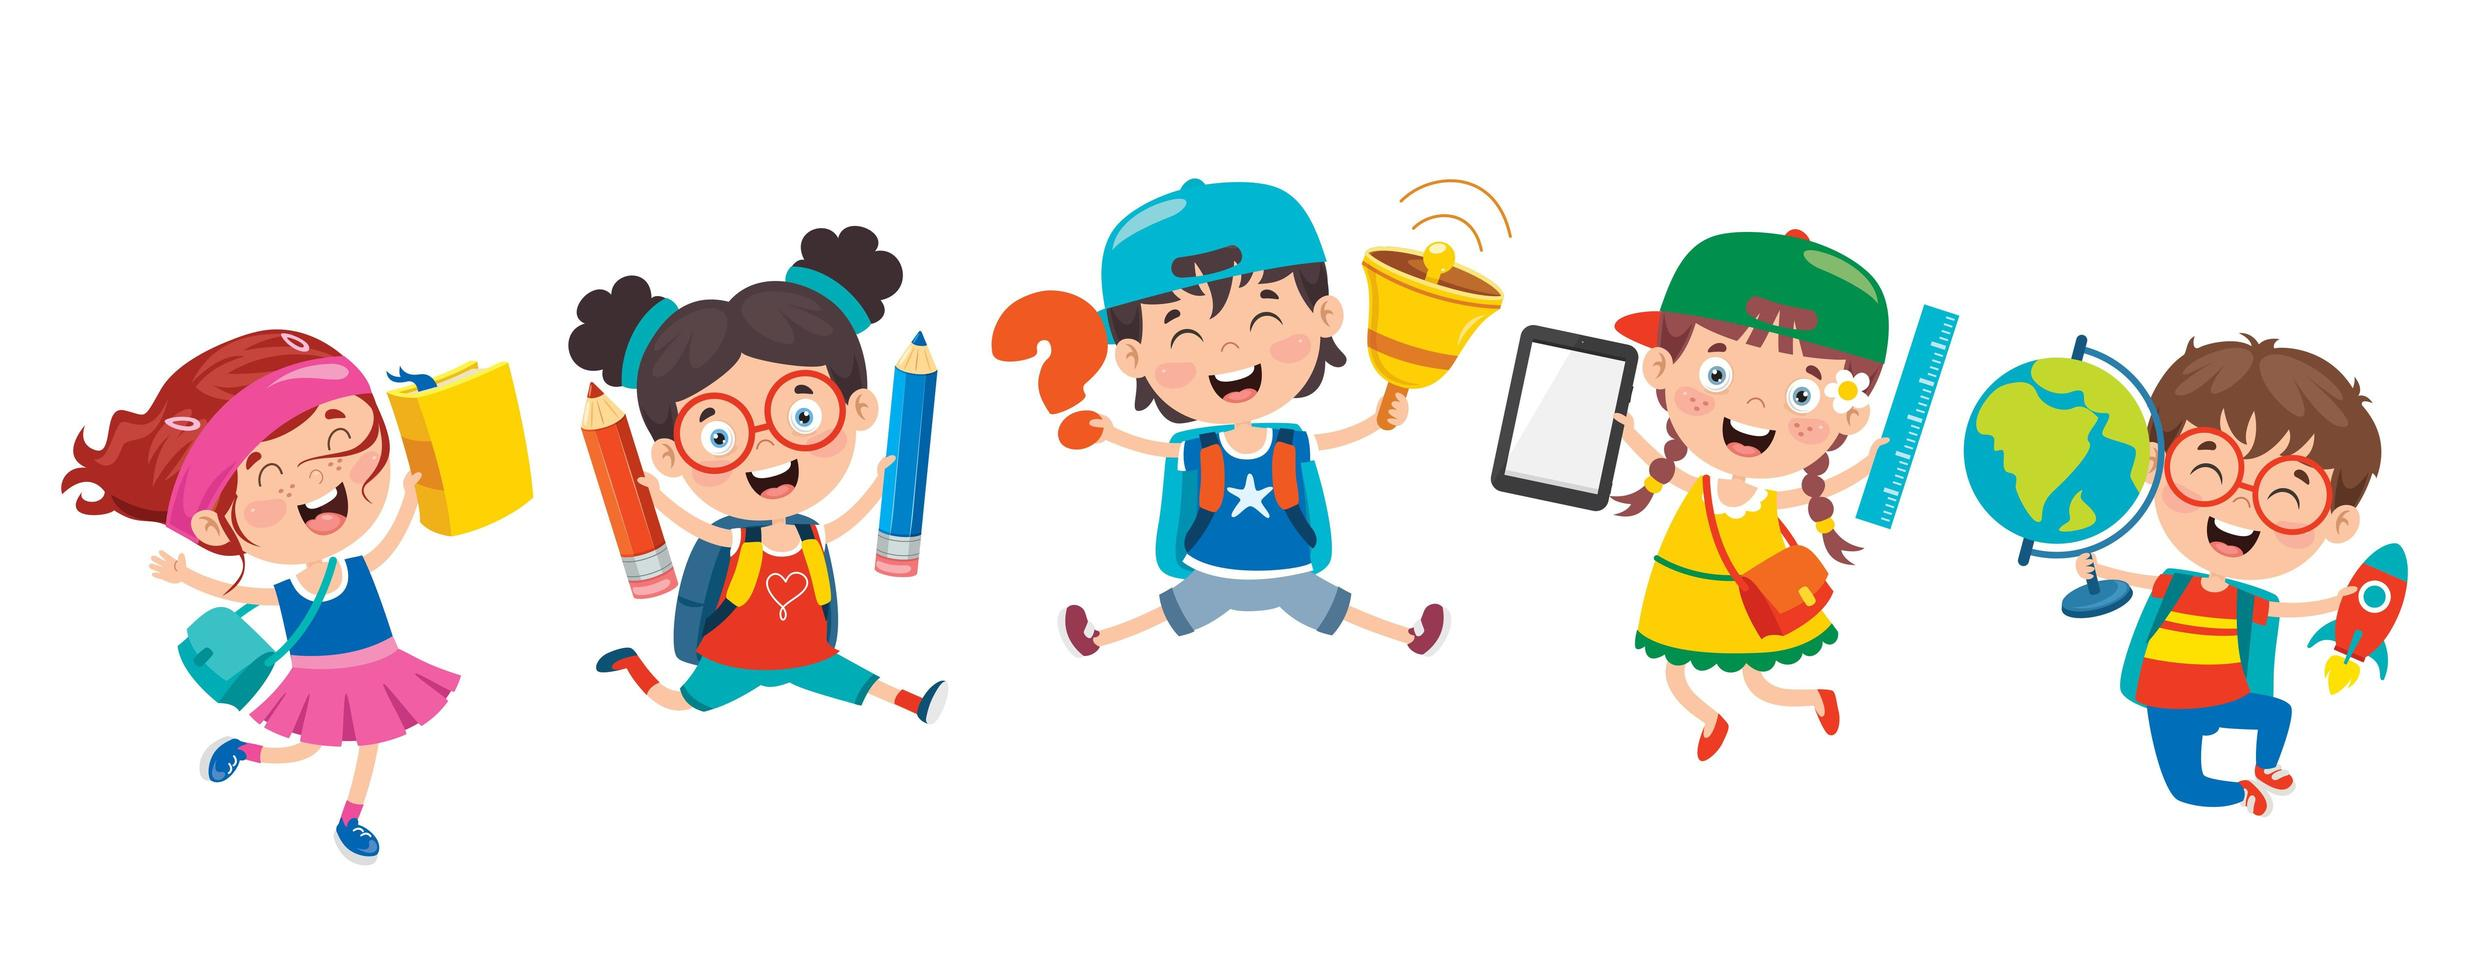 glada barn som håller skolmaterial vektor